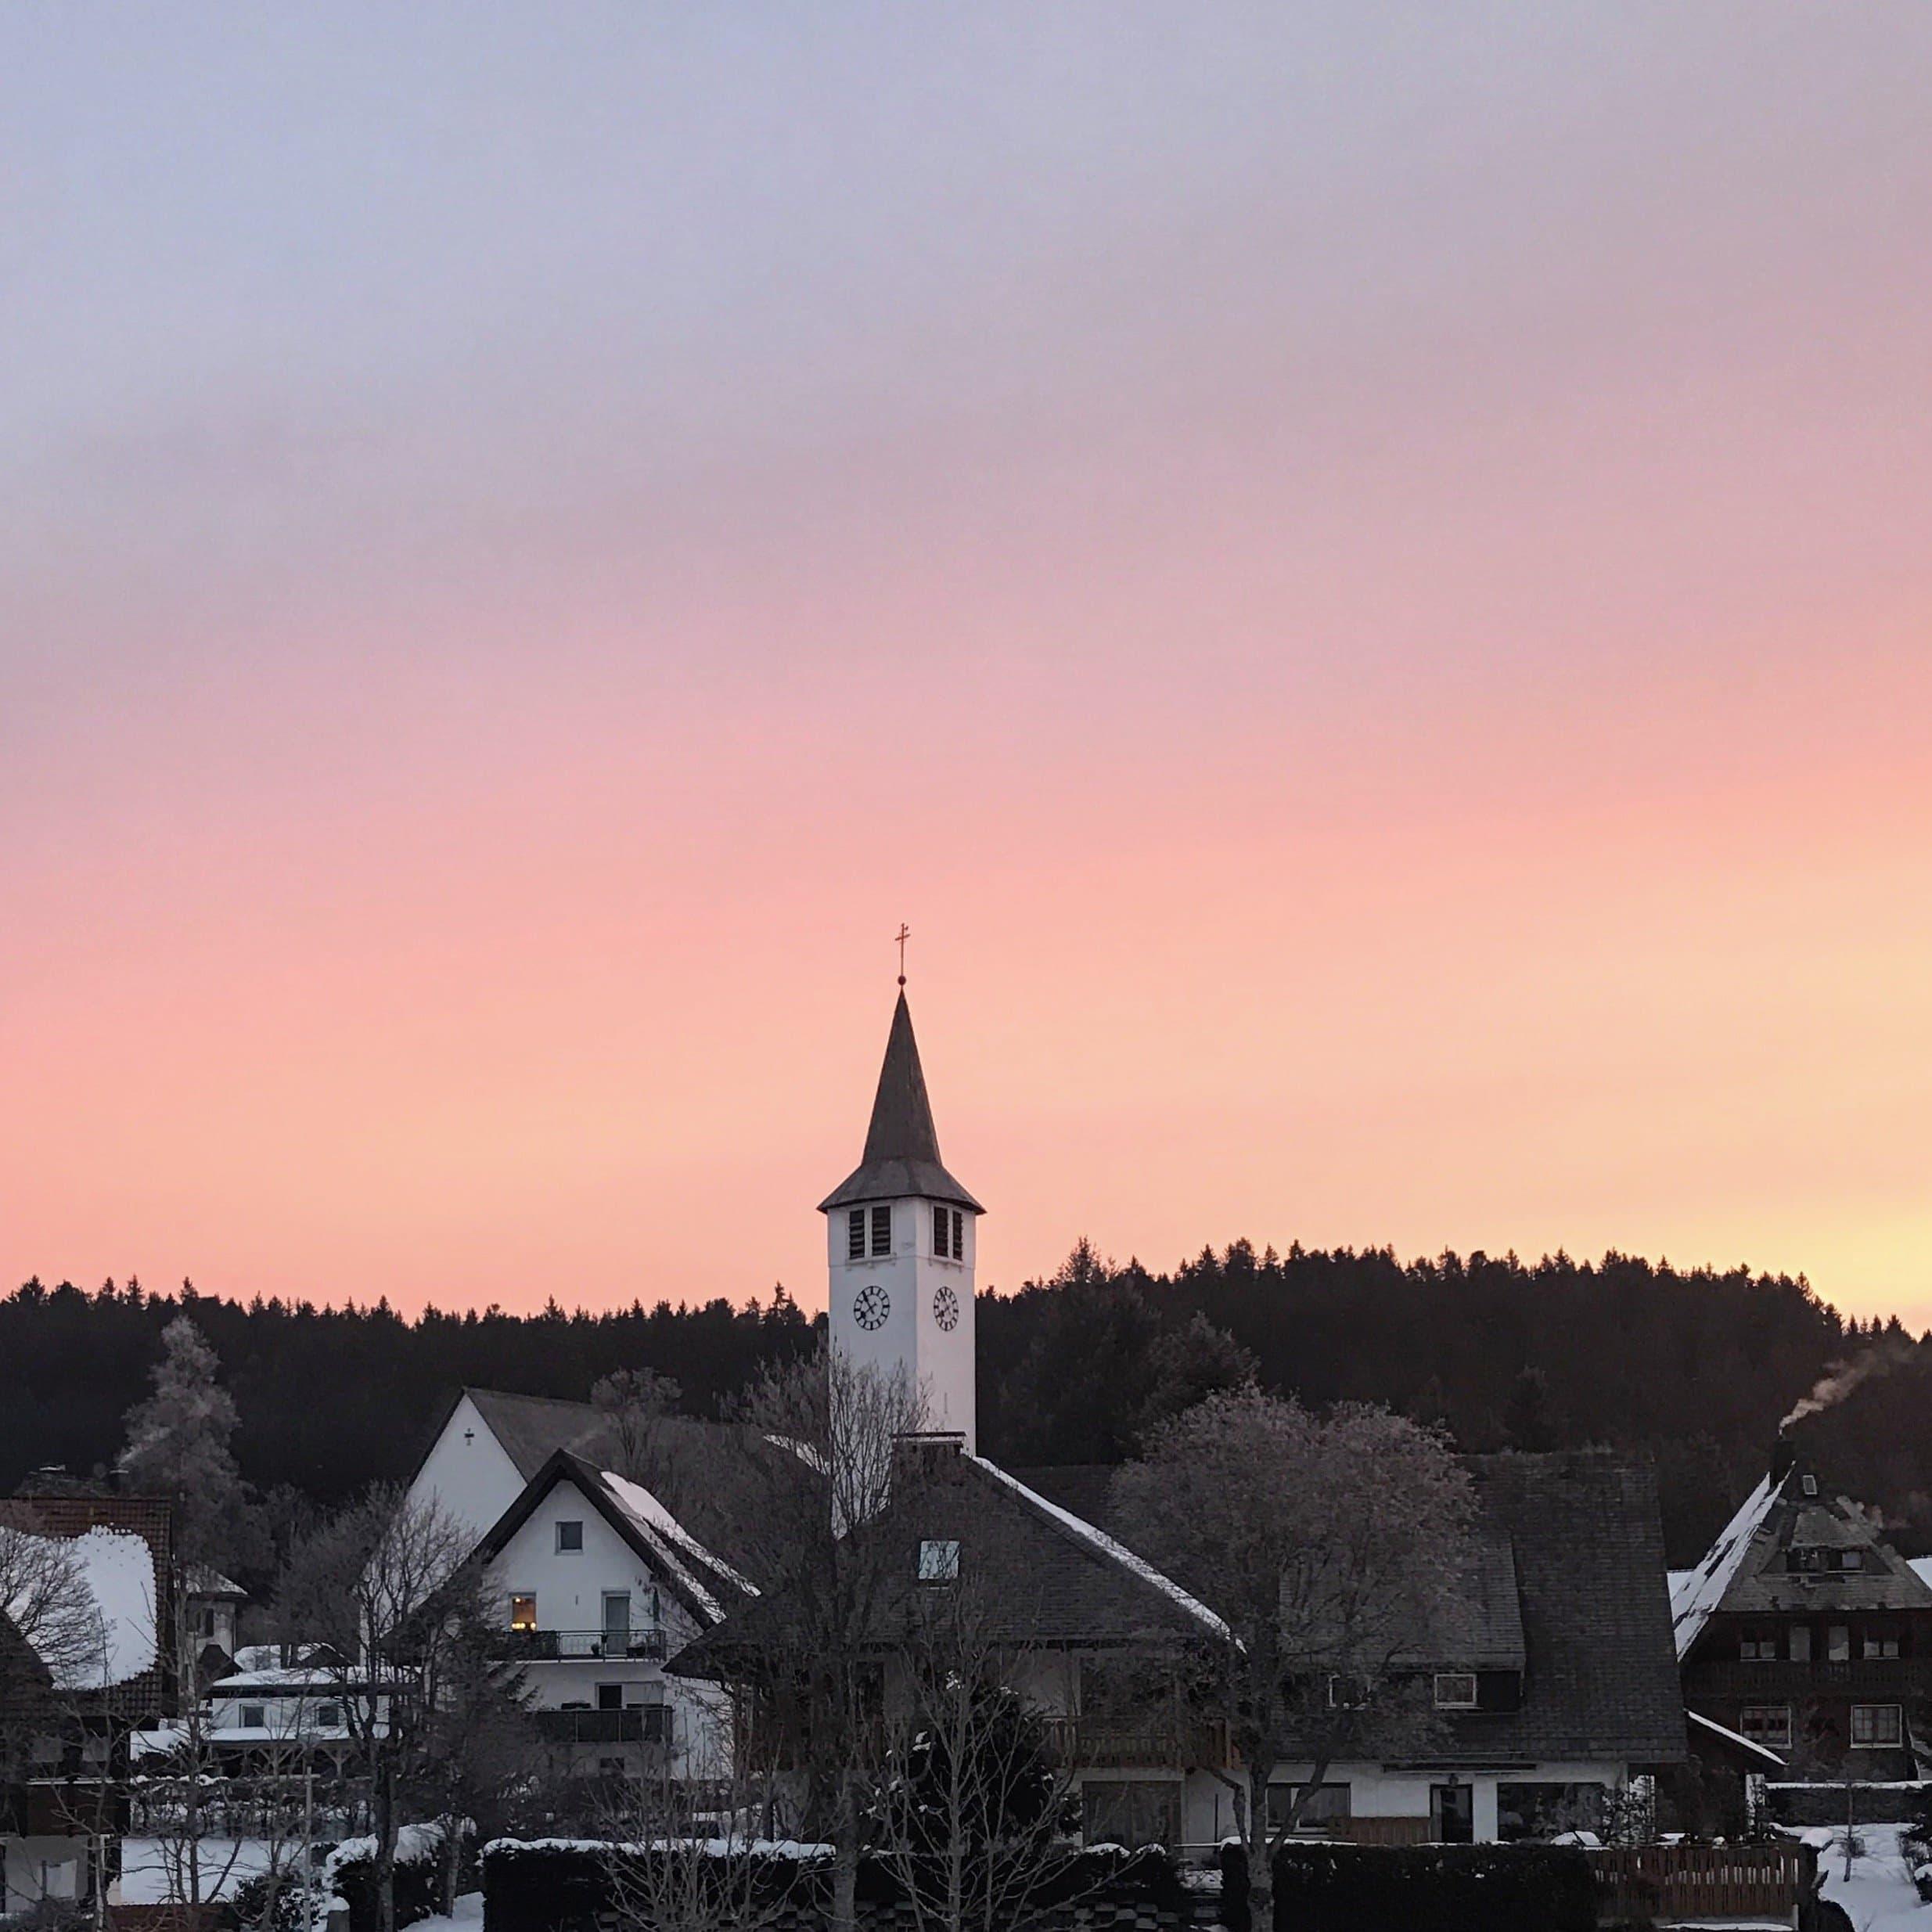 Titisee Morgenrot und Sonnenaufgang hinter der Kirche